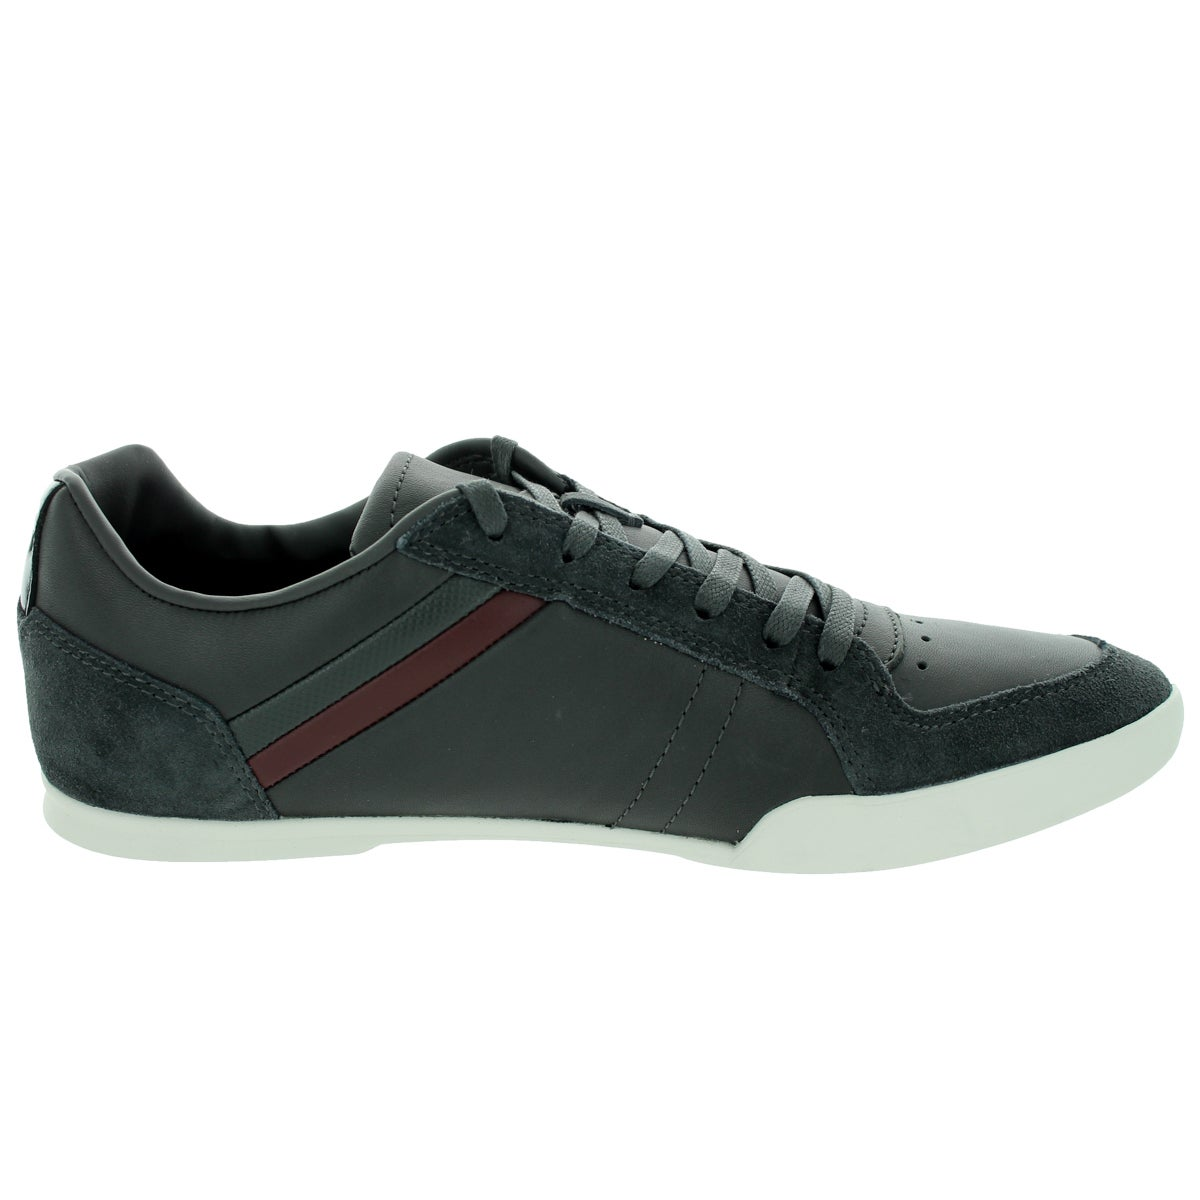 c92482543e6a30 Shop Lacoste Men s Figuera 3 Srm Dk Casual Shoe - Free Shipping Today -  Overstock.com - 12330668